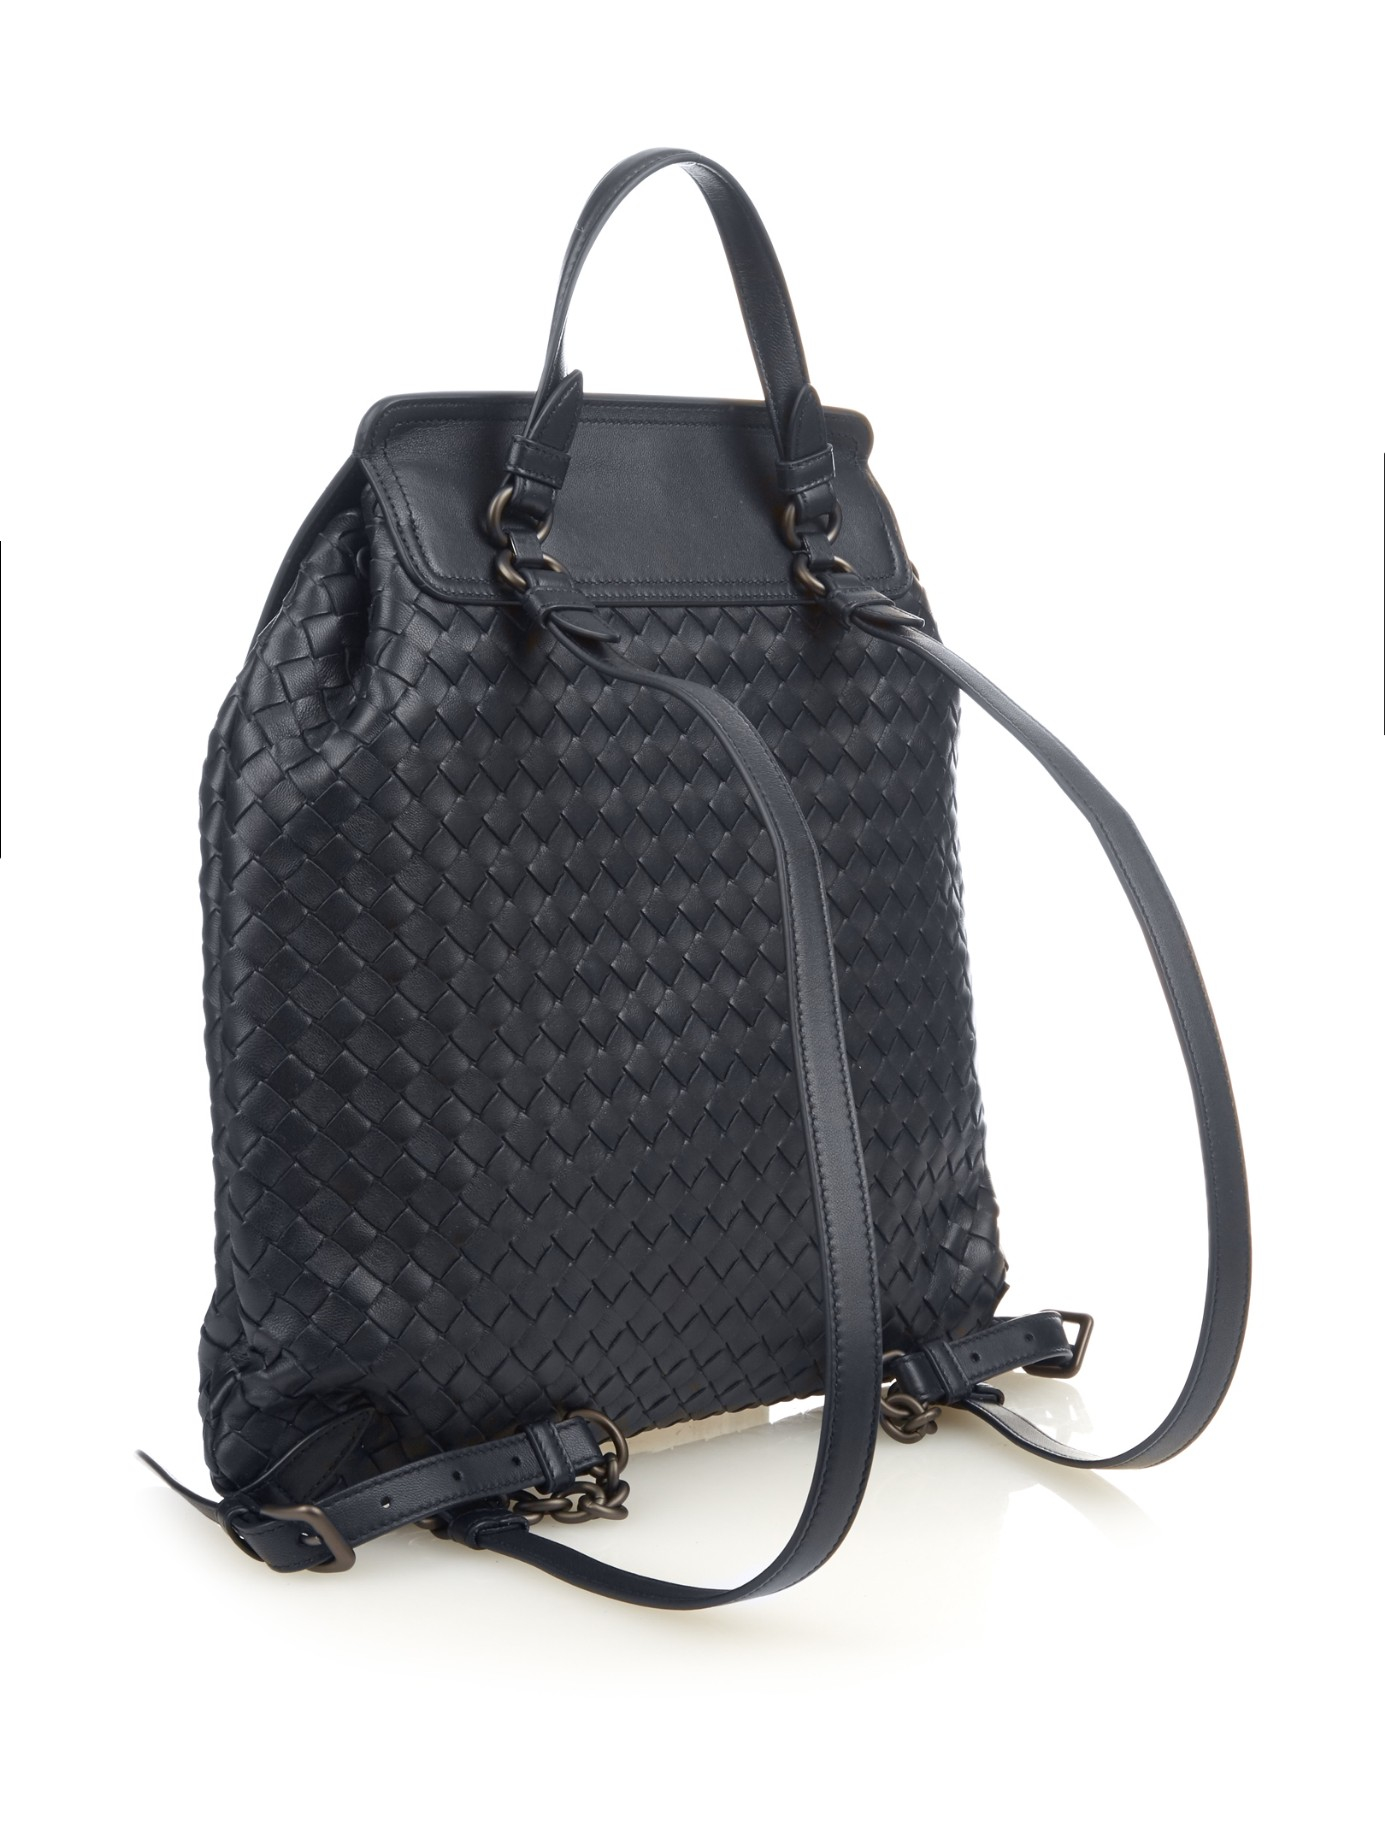 977f89a752 Lyst - Bottega Veneta Intrecciato Leather Backpack in Blue